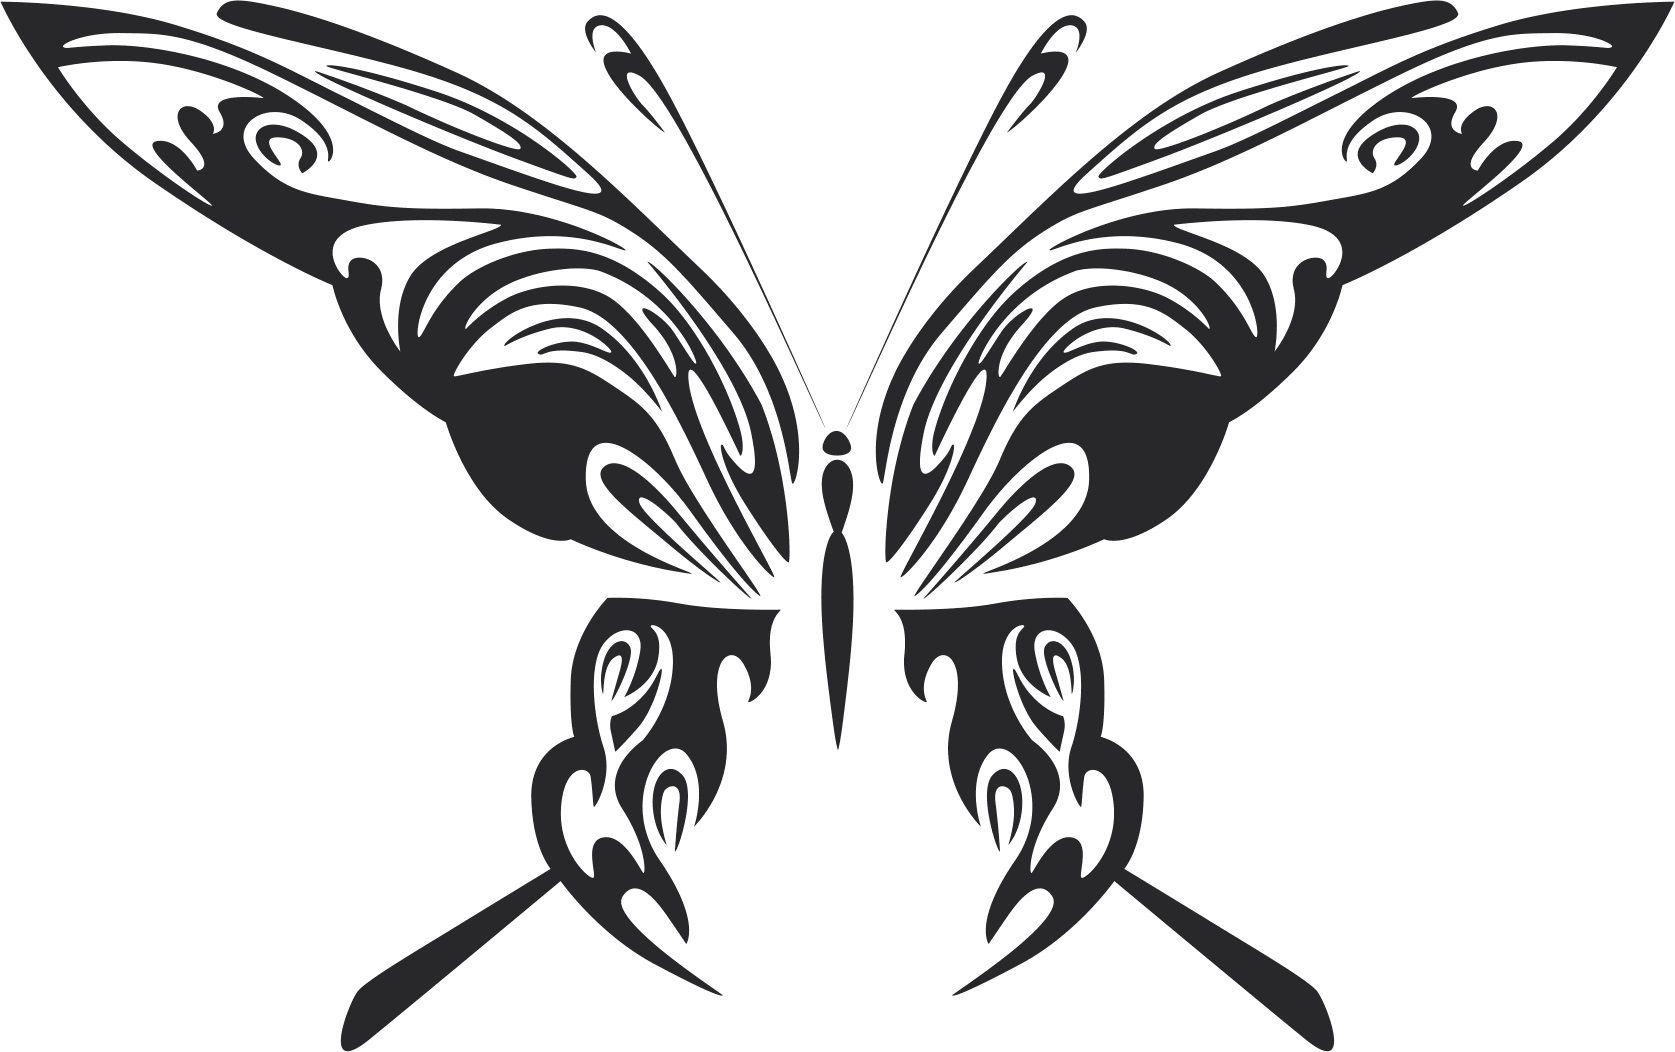 Tattoo Tribal Butterfly Metal Art Design Free DXF File